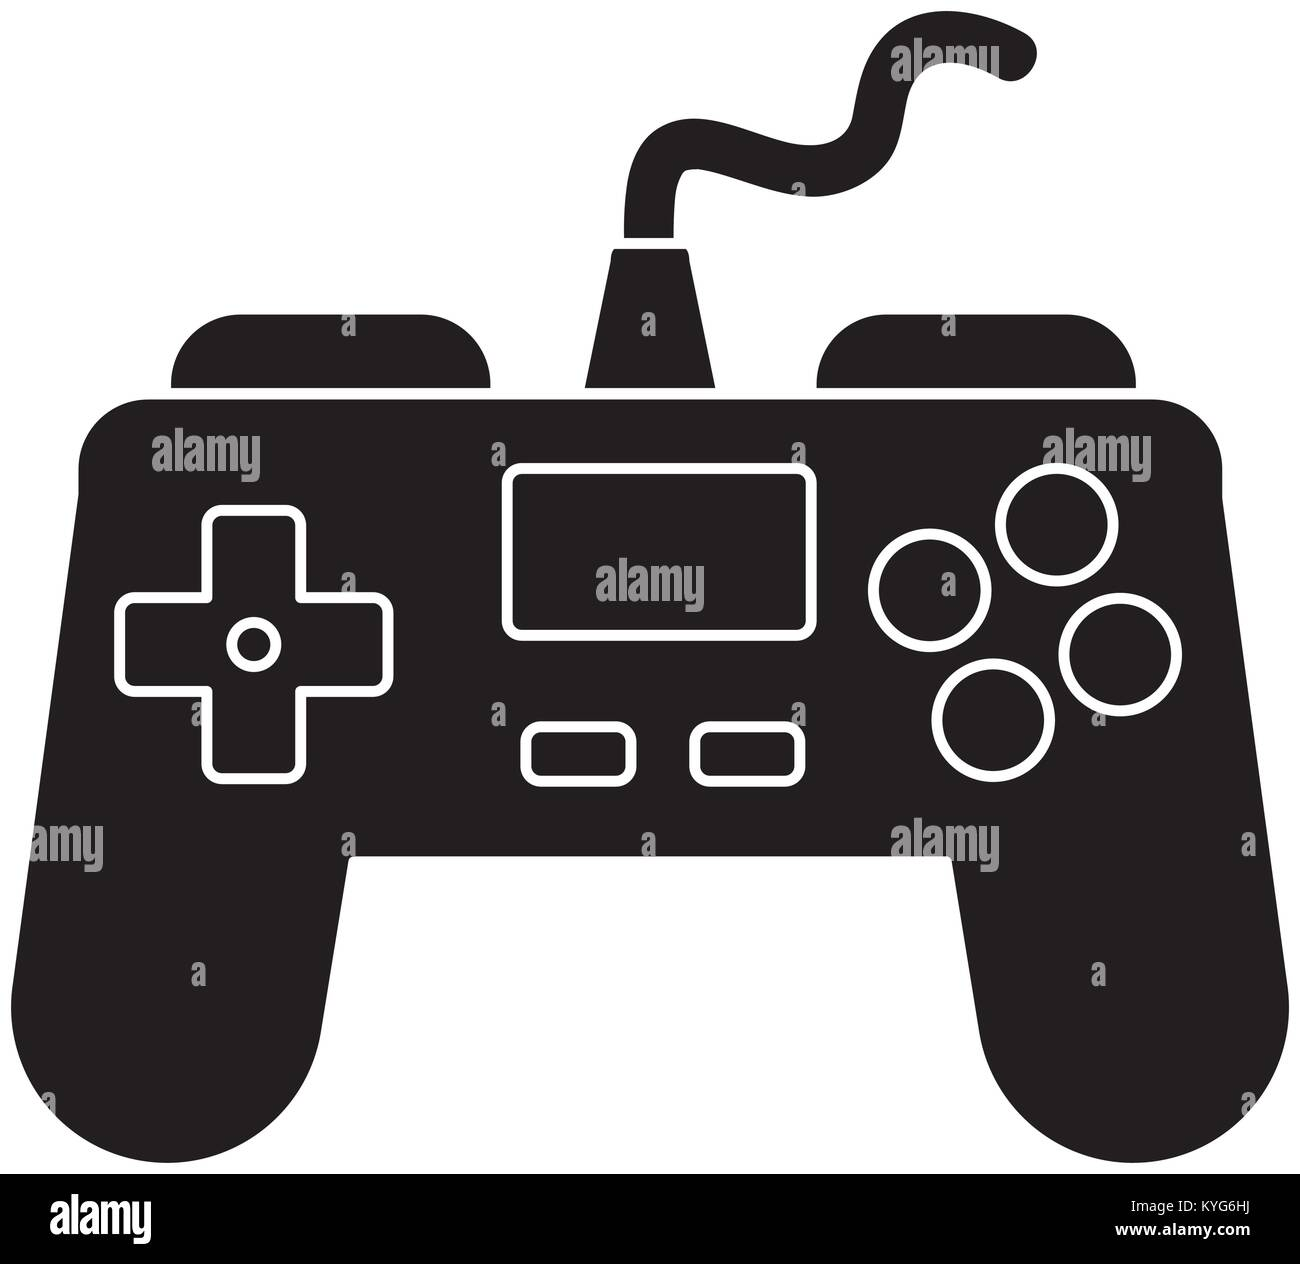 Gamepad videogame symbol stock vector art illustration vector gamepad videogame symbol gamepad videogame symbol stock vector buycottarizona